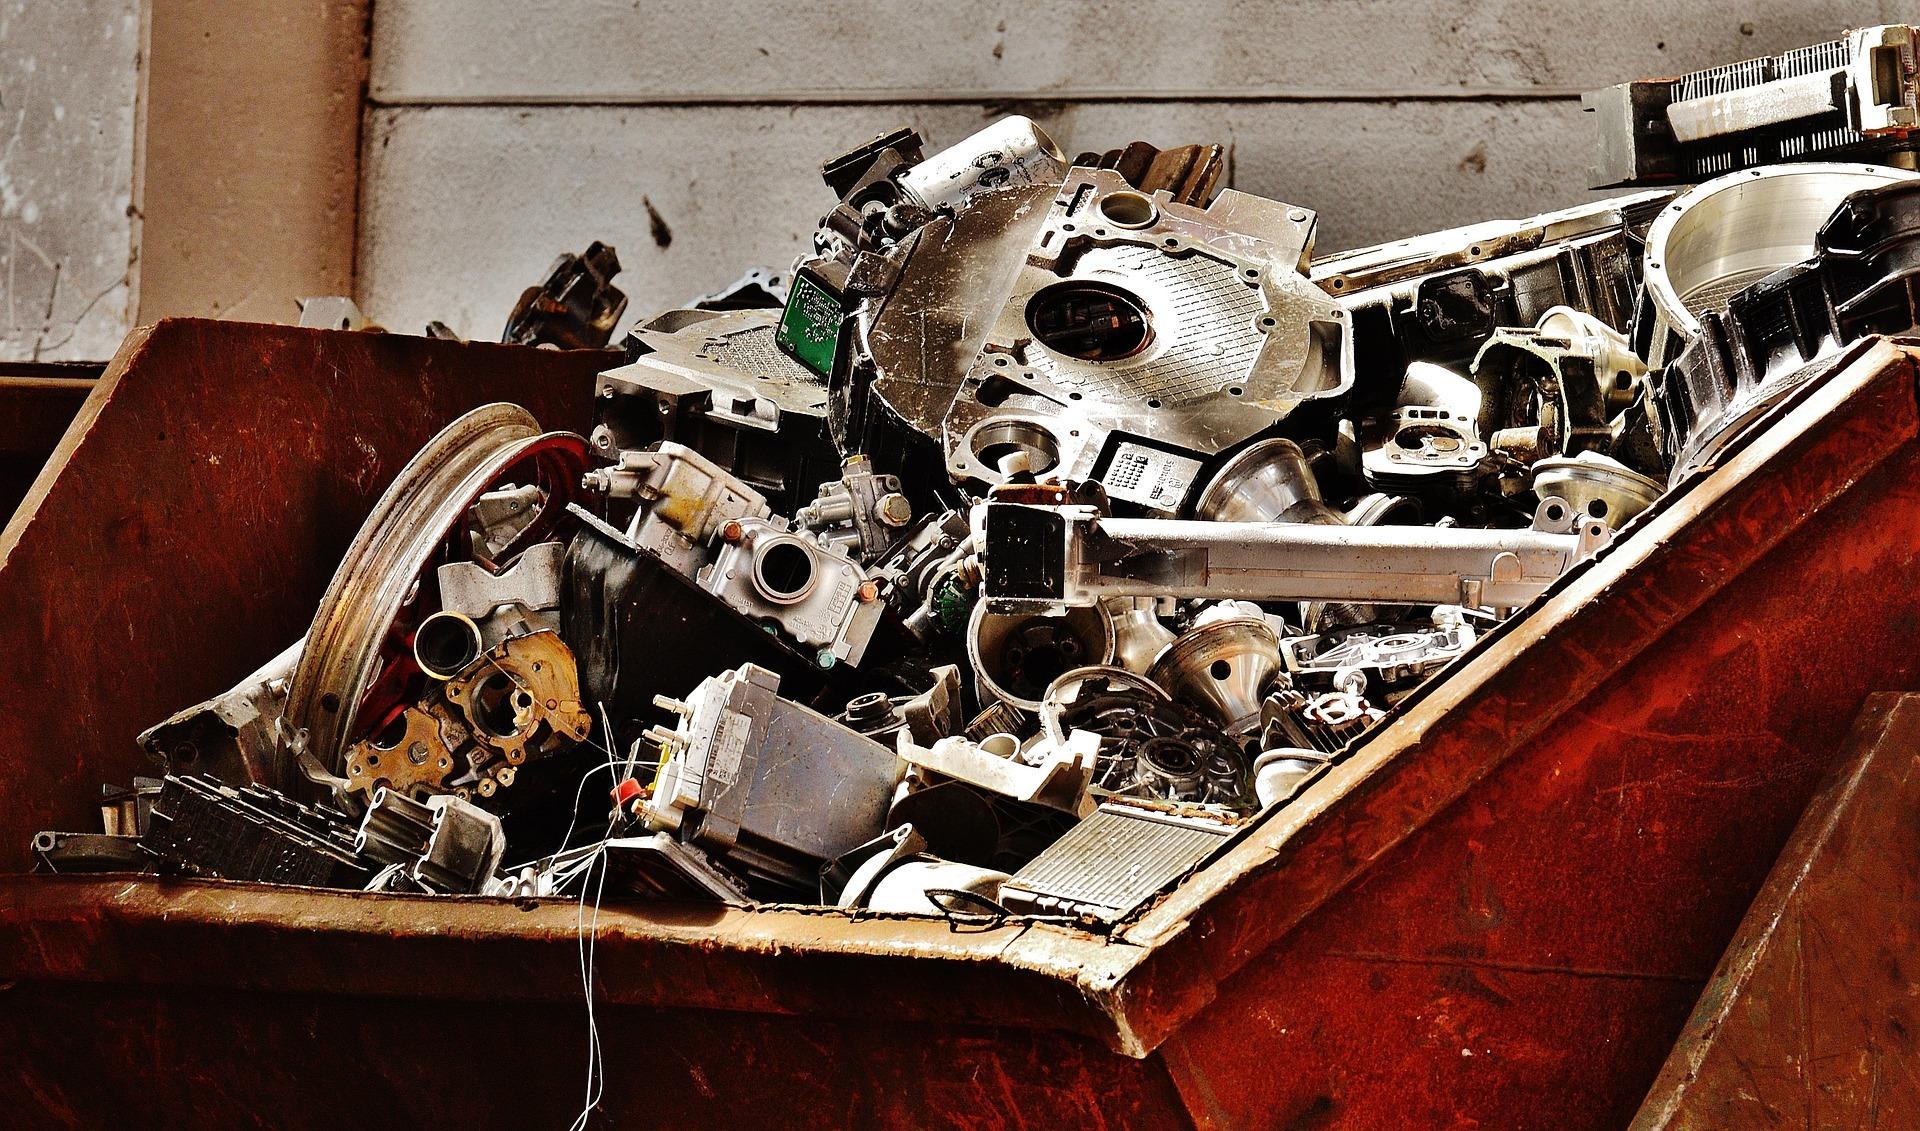 Greensteel company looks to recycle large amount of UK scrap metal